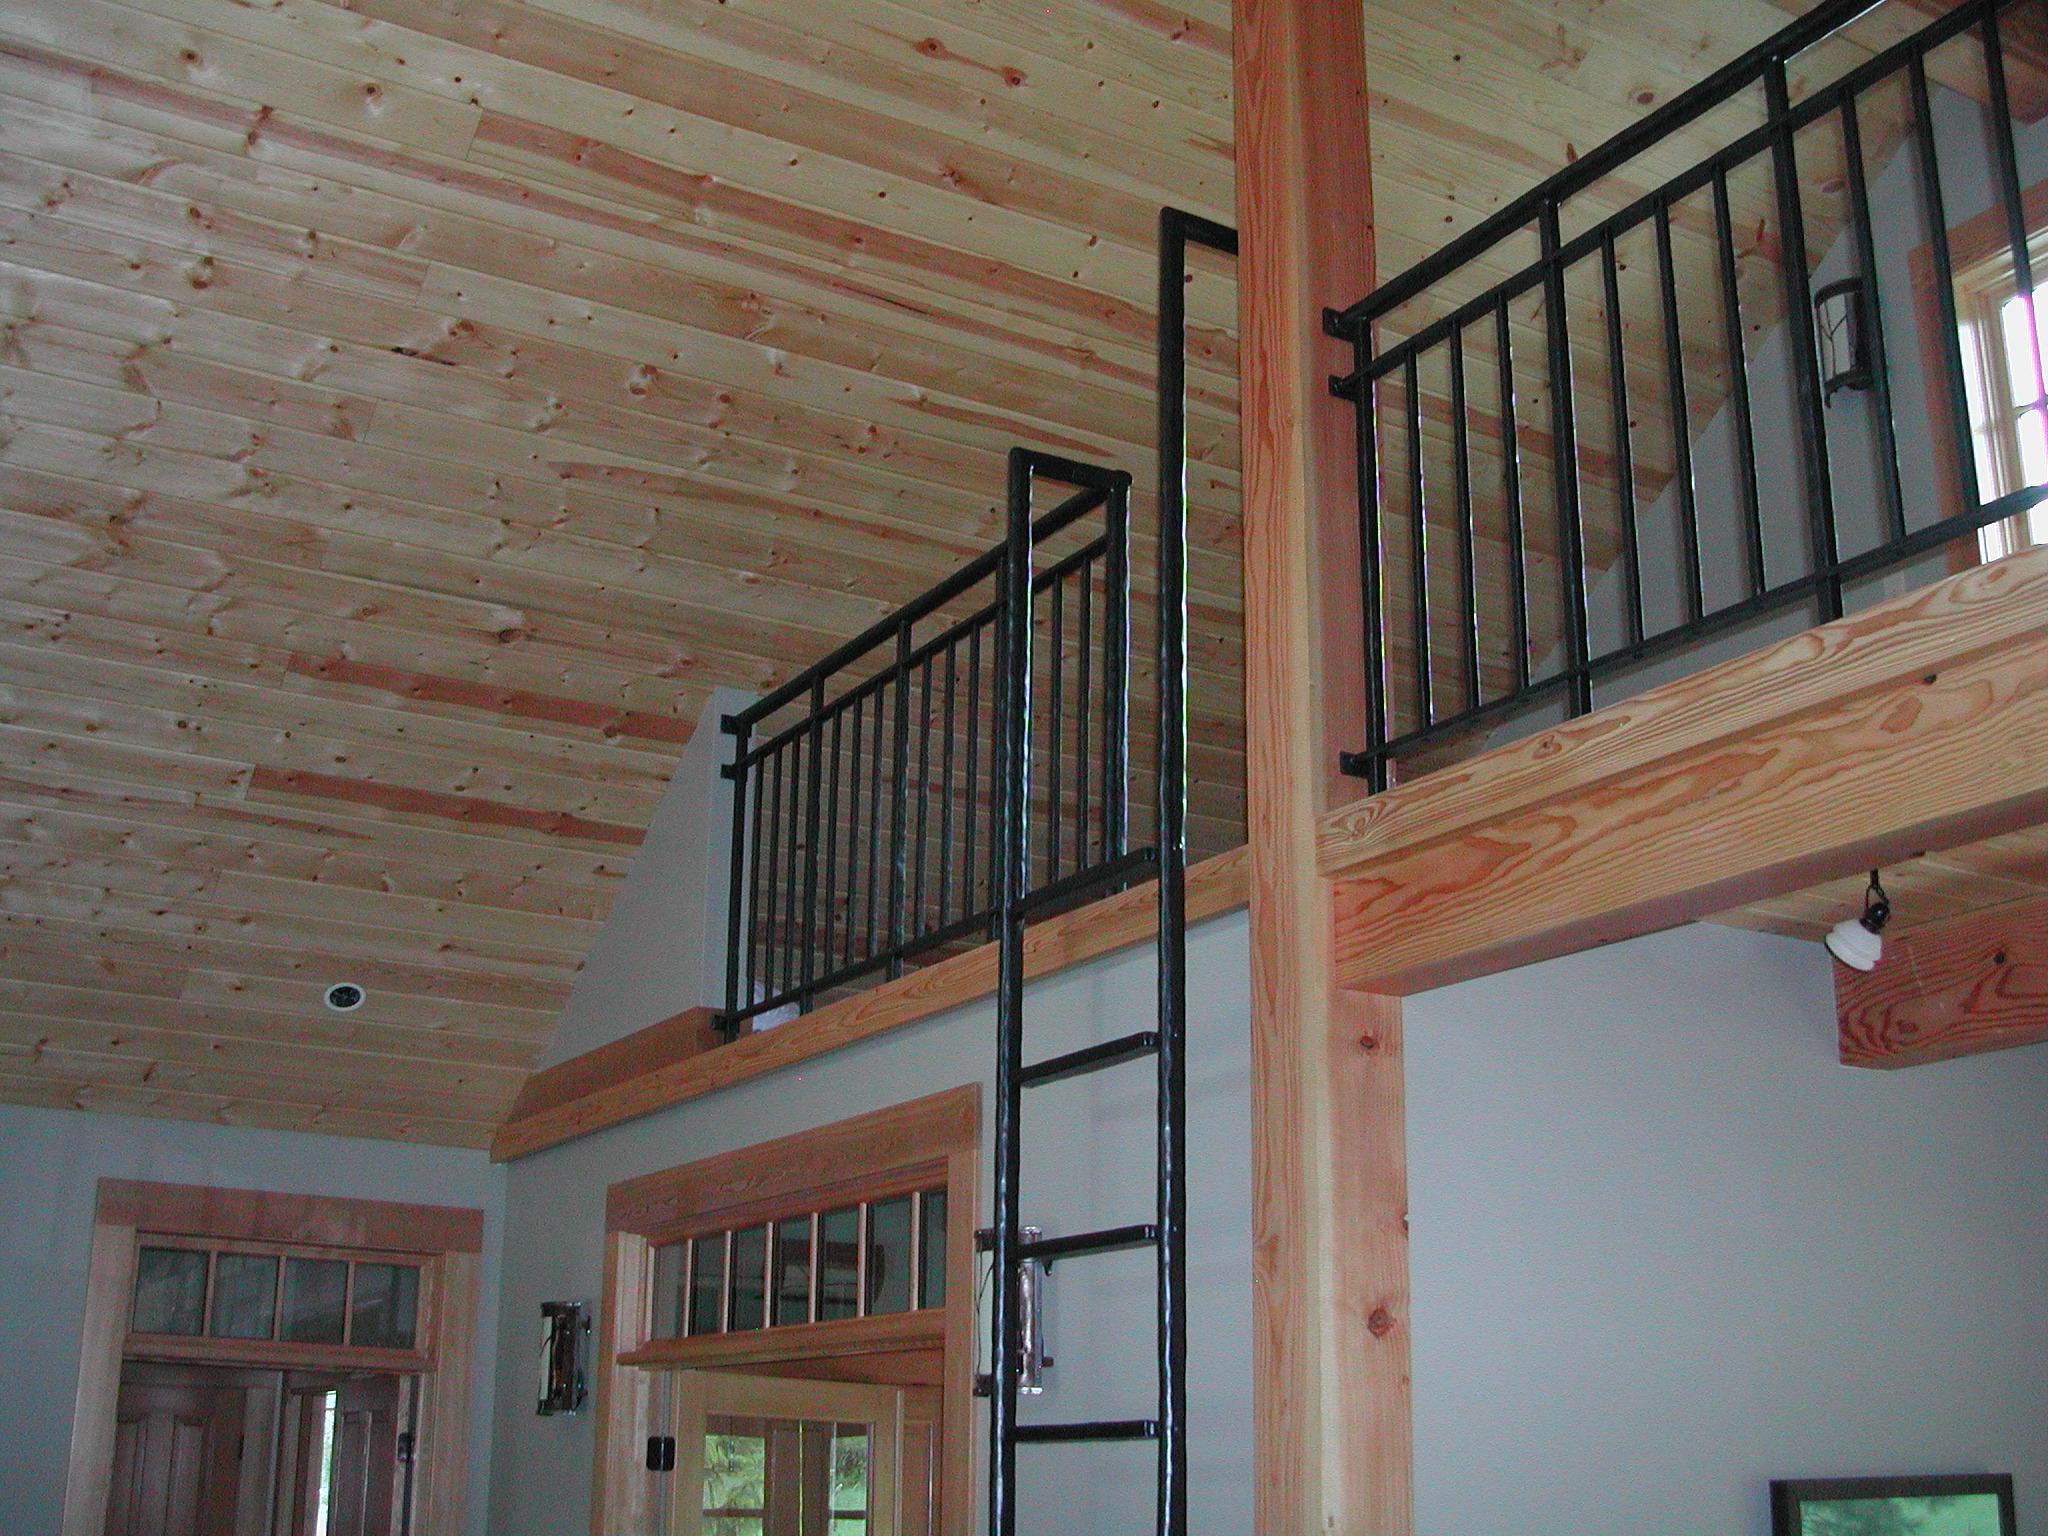 loft_and_ladder_railing.JPG